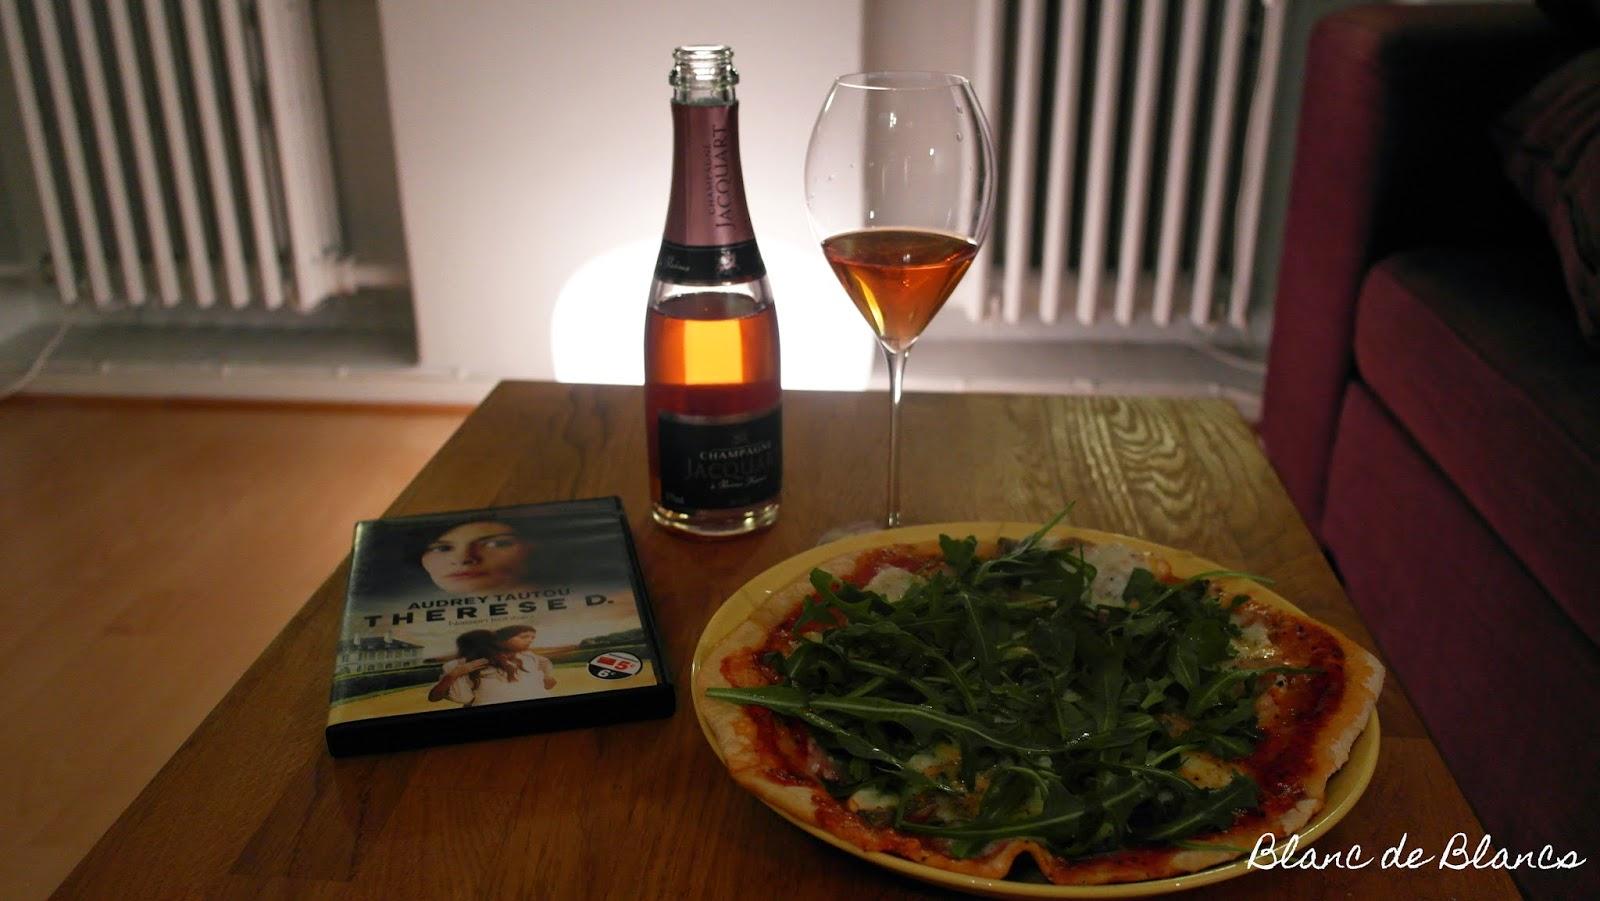 Jacquart Rosé, pizza ja ranskalainen elokuva - www.blancdeblancs.fi